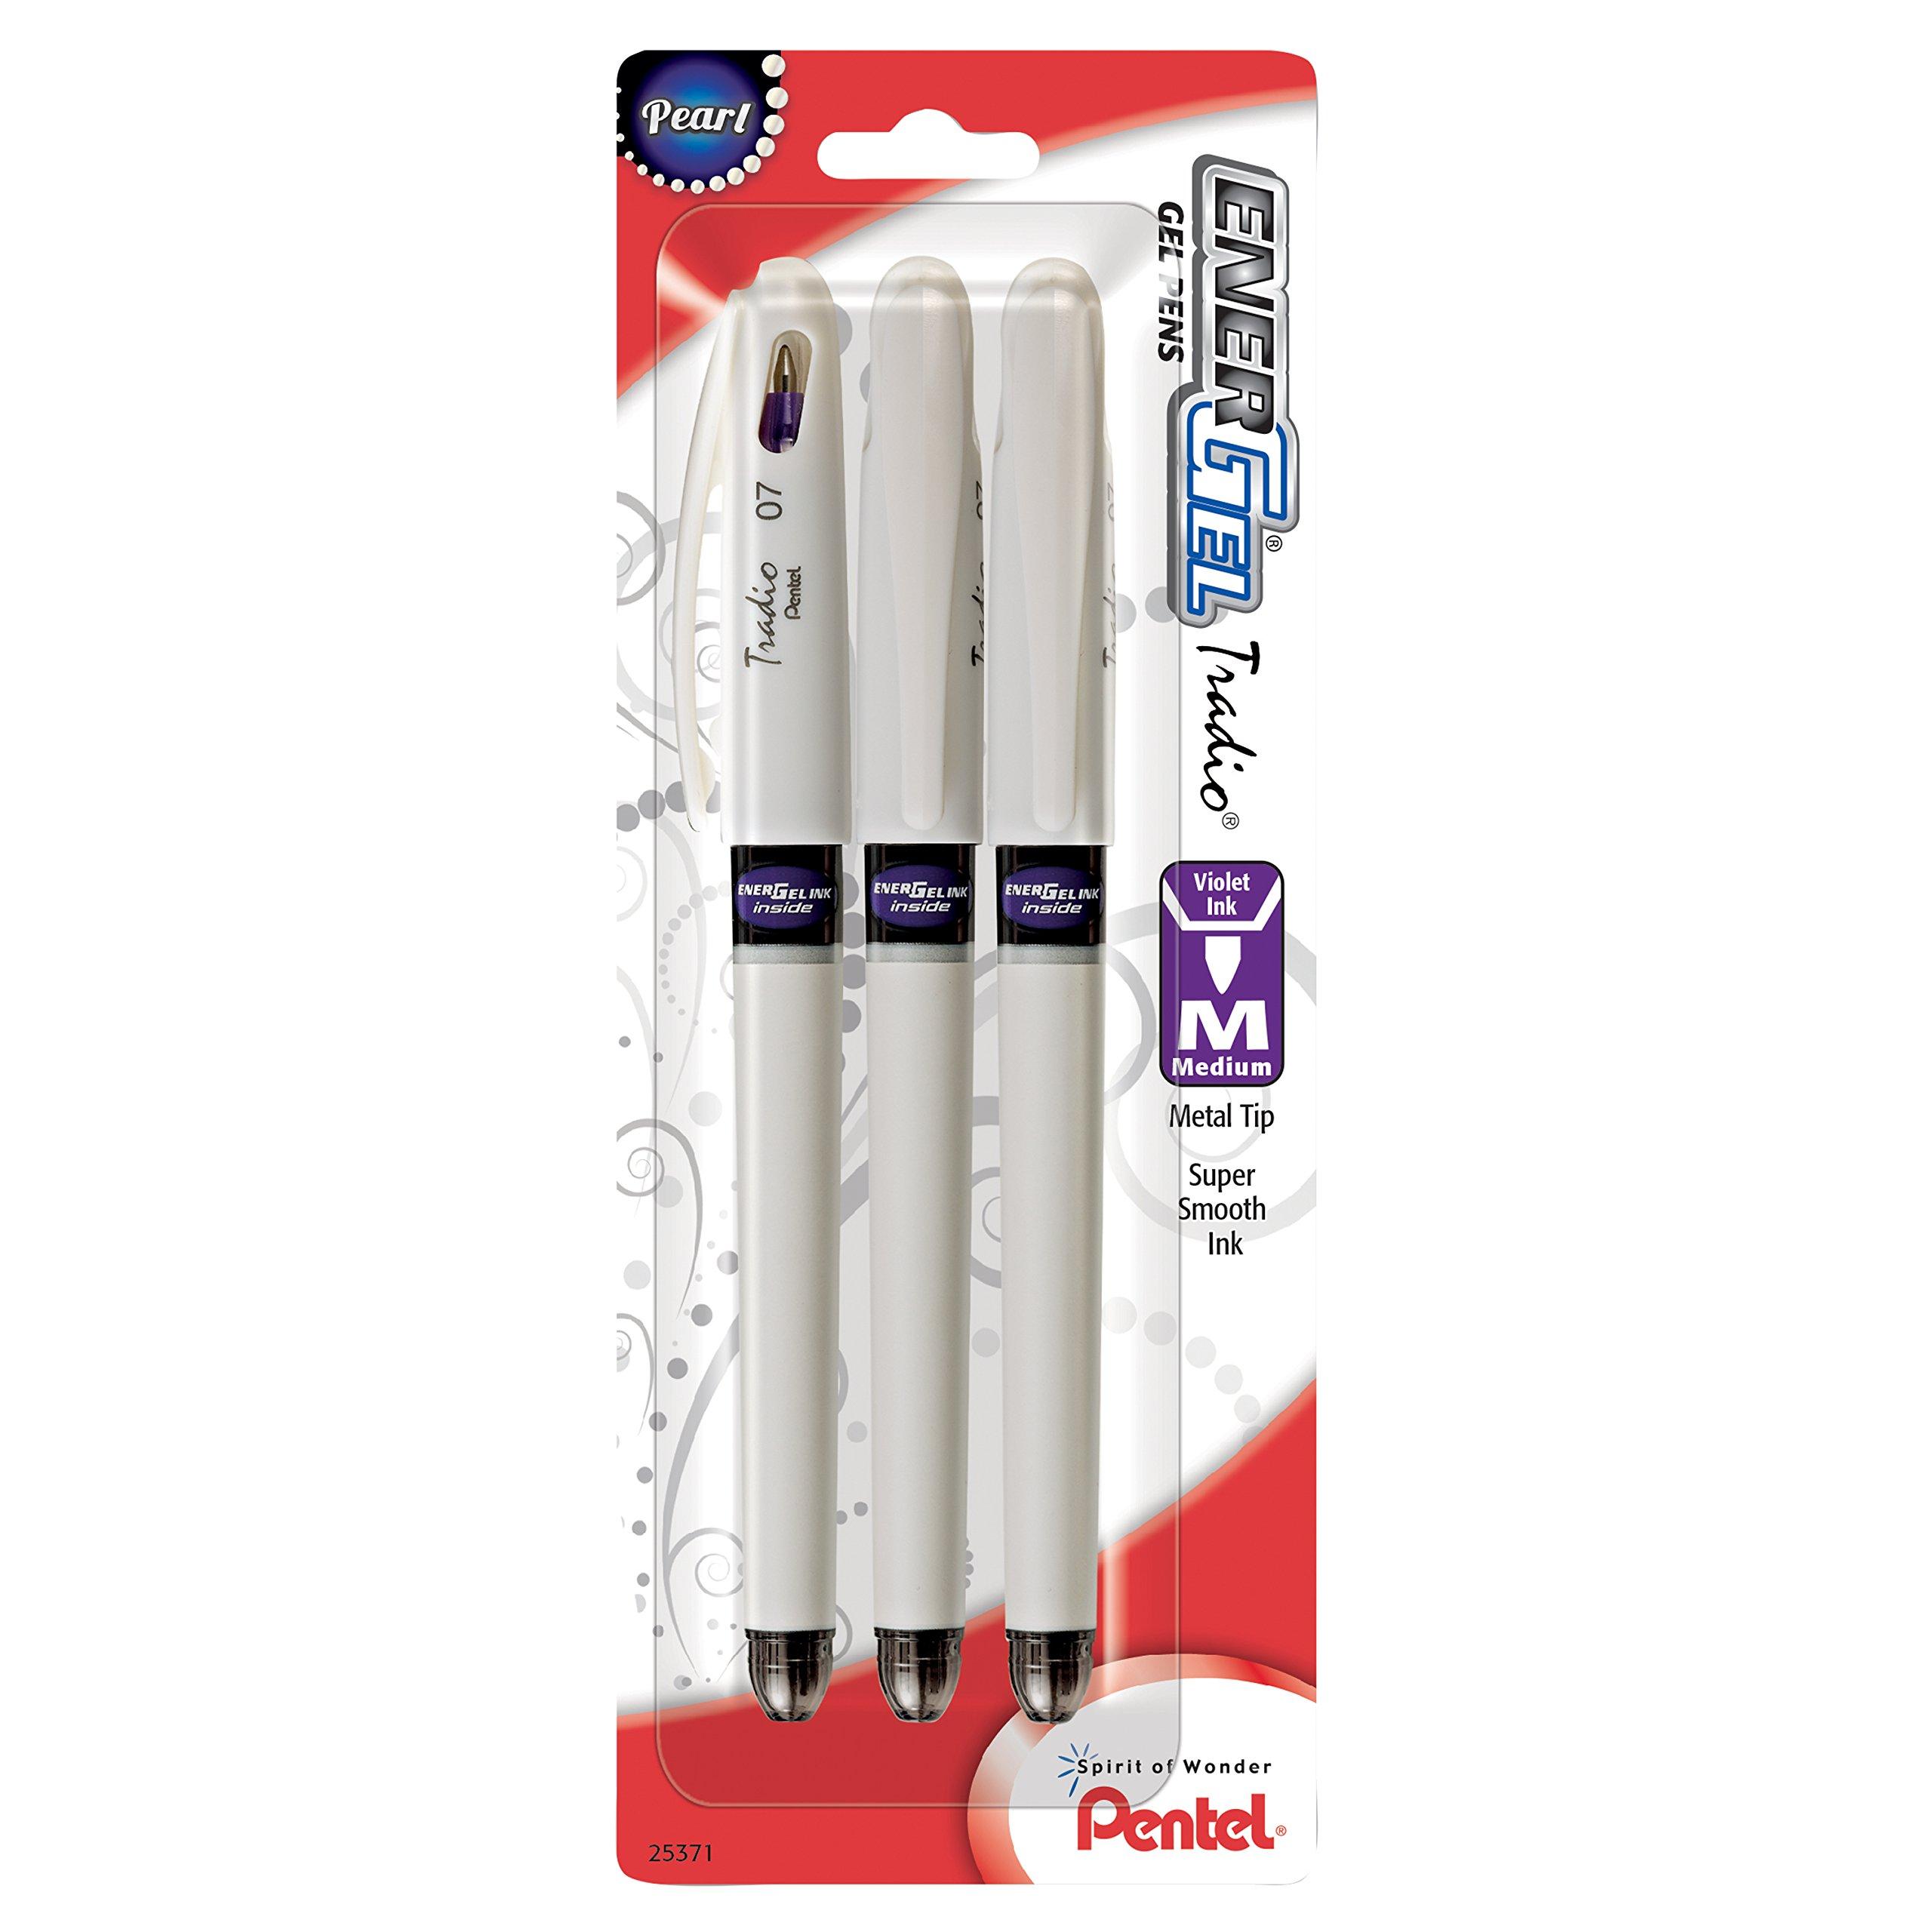 Pentel EnerGel Tradio Pearl Liquid Gel Pen, 0.7mm, Medium Line Capped, Violet, 3 Pack (BL117WBP3V)